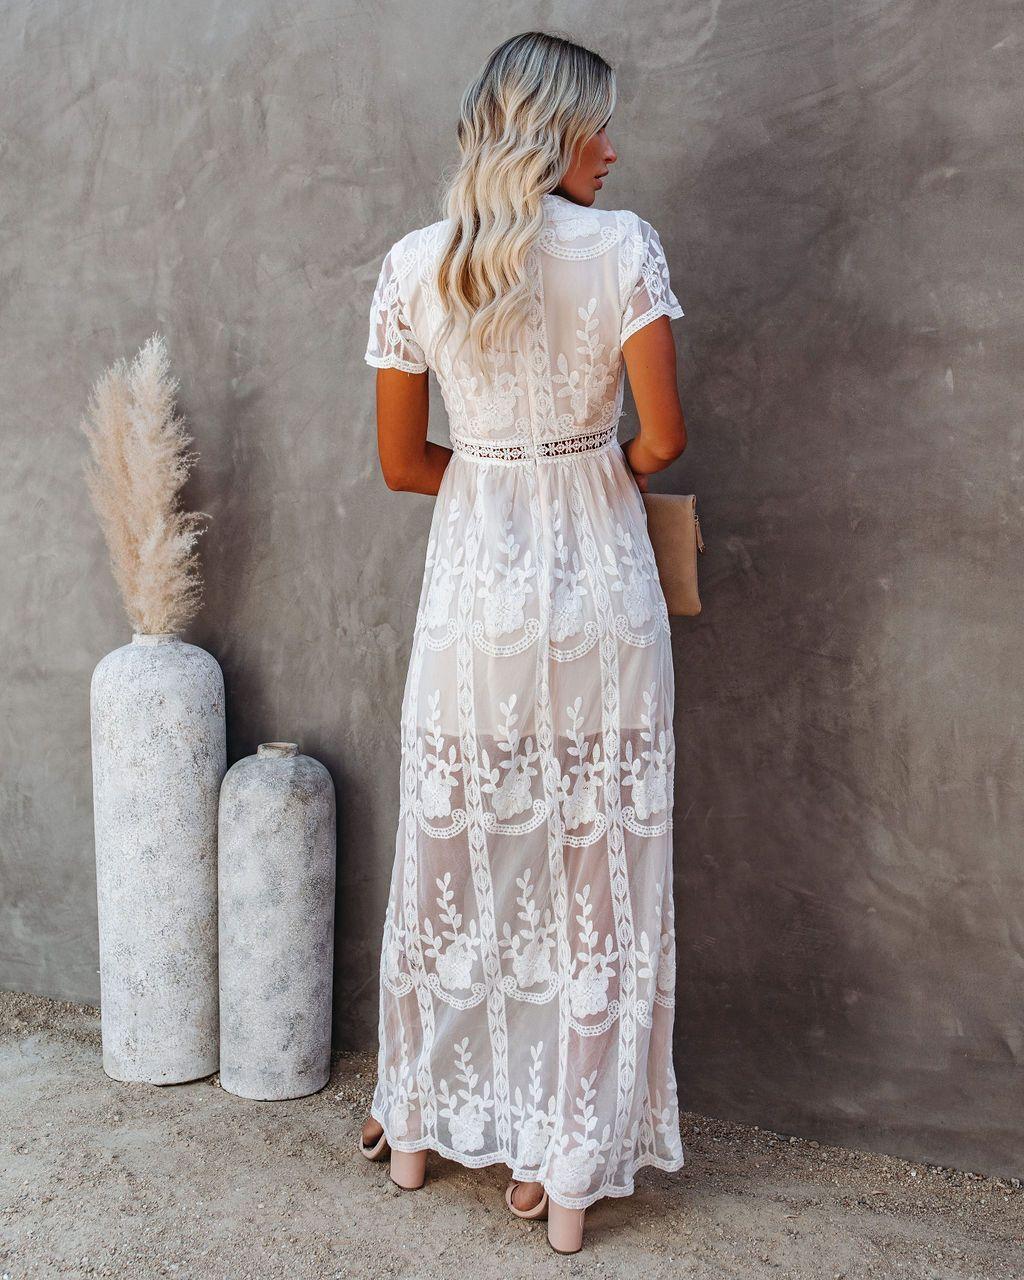 Rebecca Dress Floral Lace Maxi Dress Lace Maxi White Lace Maxi [ 1280 x 1024 Pixel ]